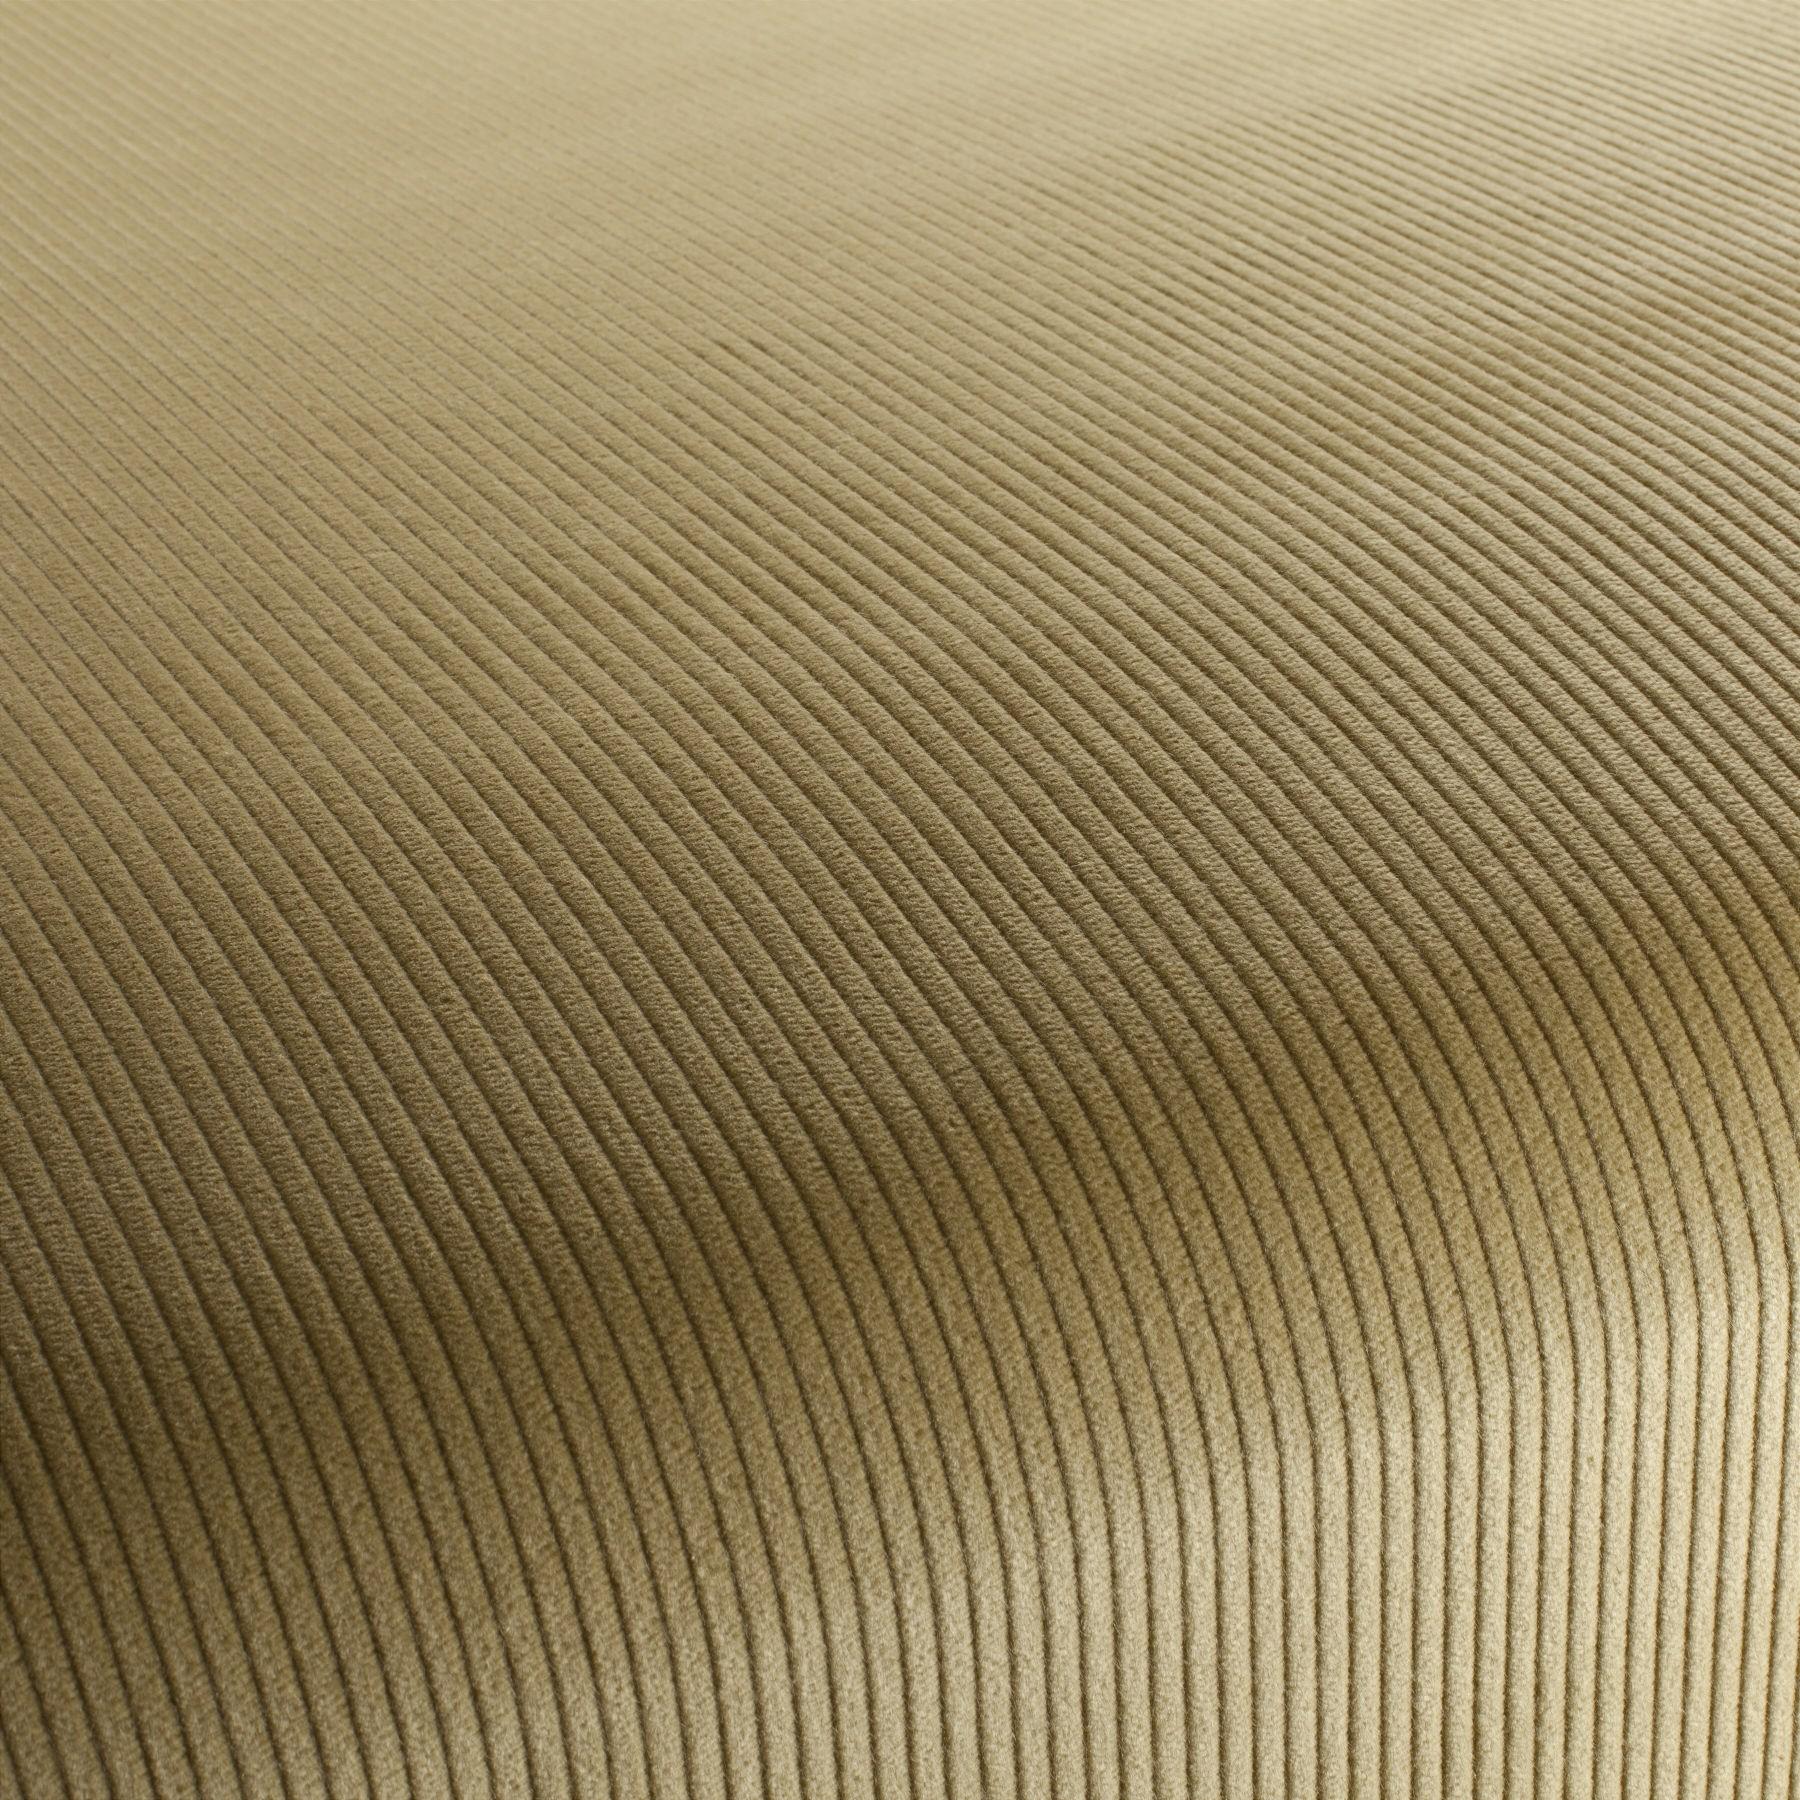 upholstery fabric cord 1 3126 041 jab anstoetz fabrics. Black Bedroom Furniture Sets. Home Design Ideas